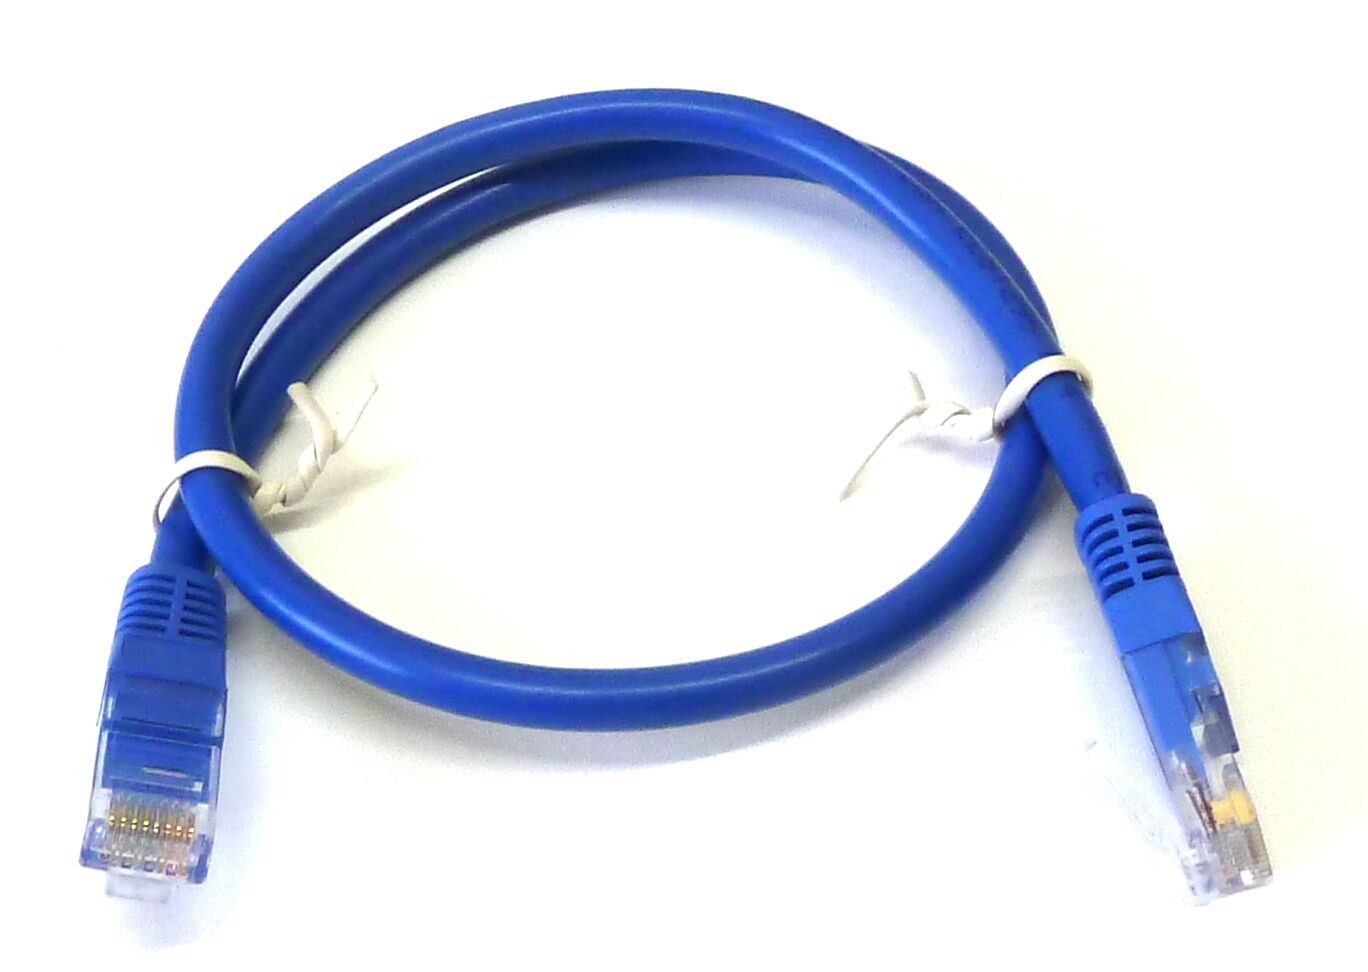 Blue Comlynx 5m Cat6 Rj45 Patch Ethernet Network Lan Internet Cable 4m Cat5e Cat 5e Lead Wire Norton Secured Powered By Verisign